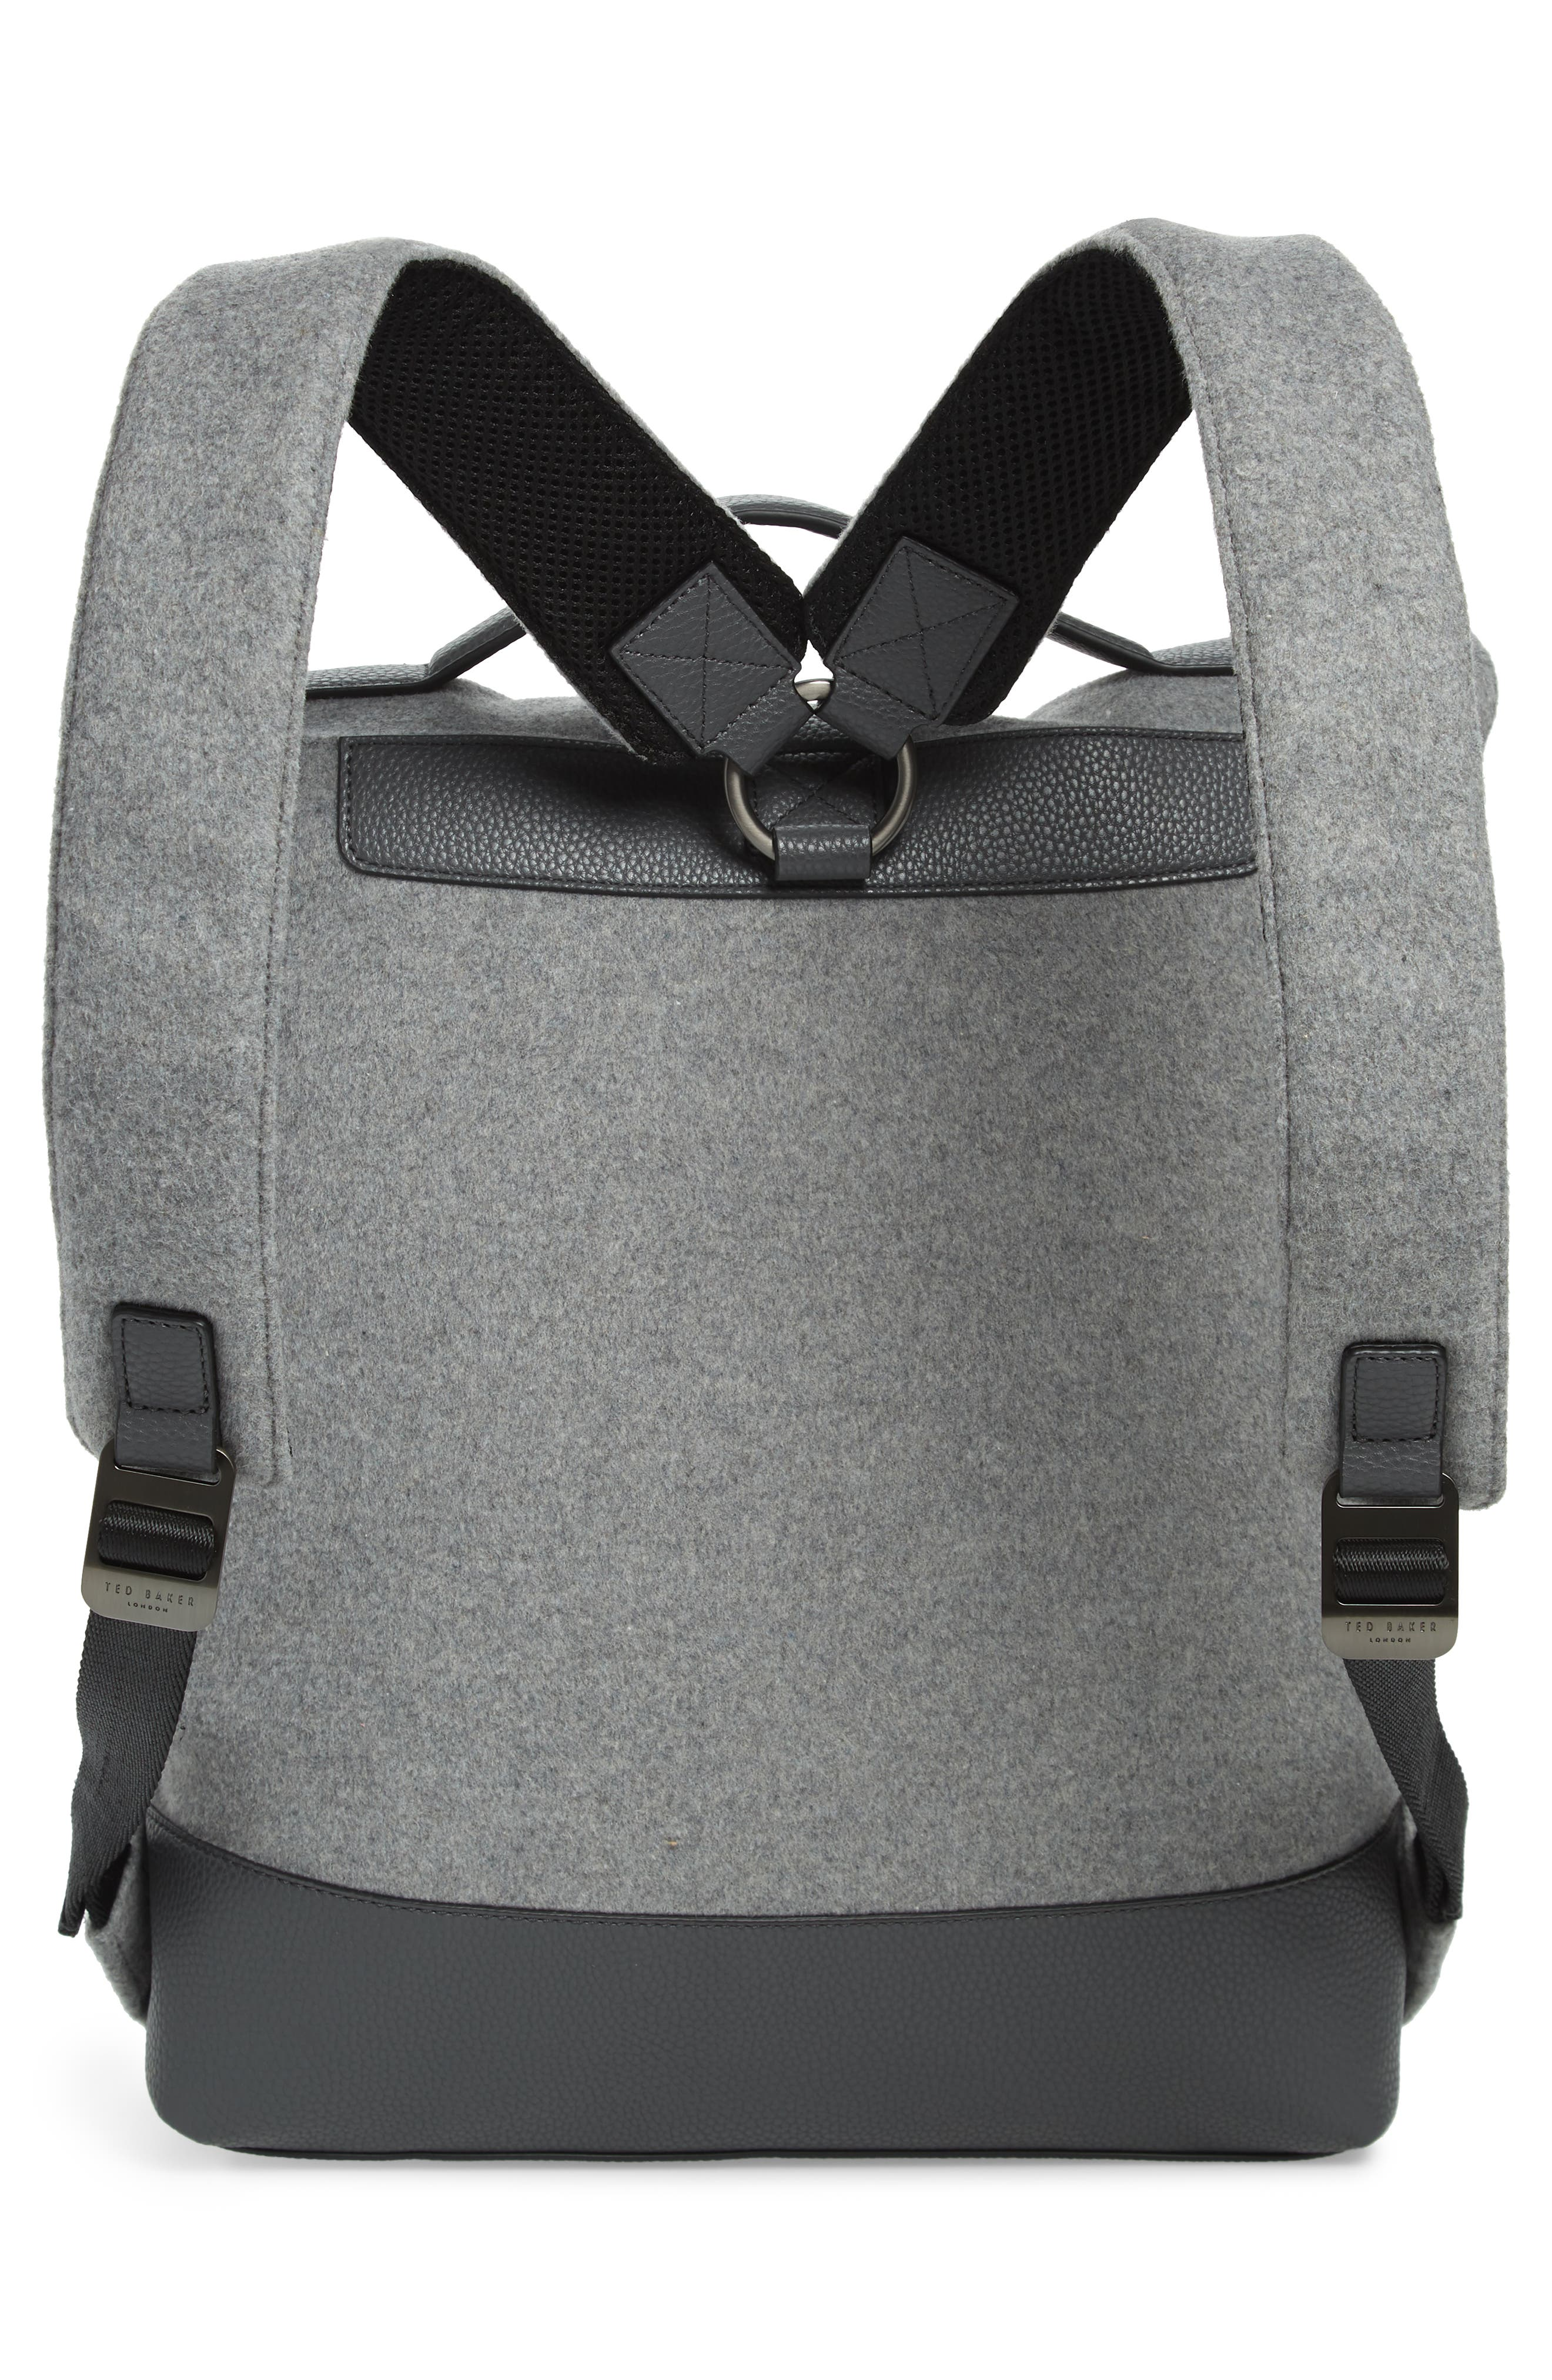 Cashed Backpack,                             Alternate thumbnail 3, color,                             GREY